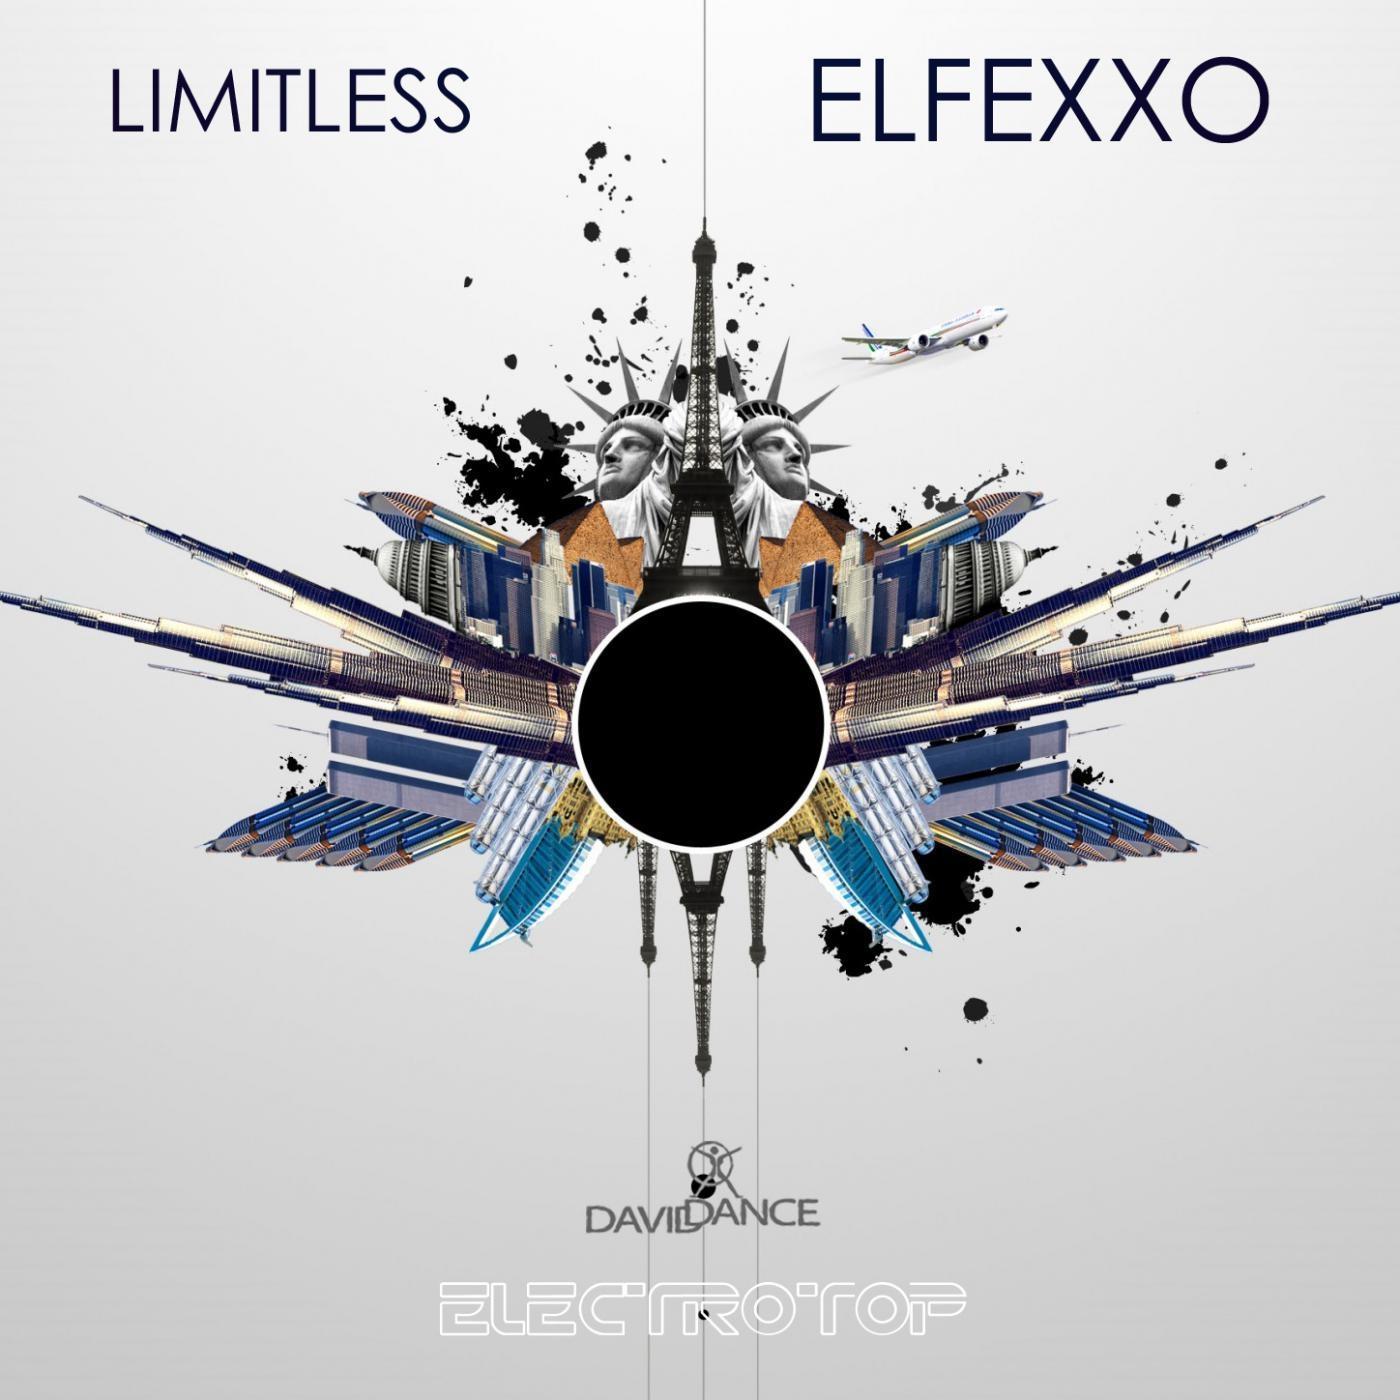 ELFEXXO - Limitless (Original mix)